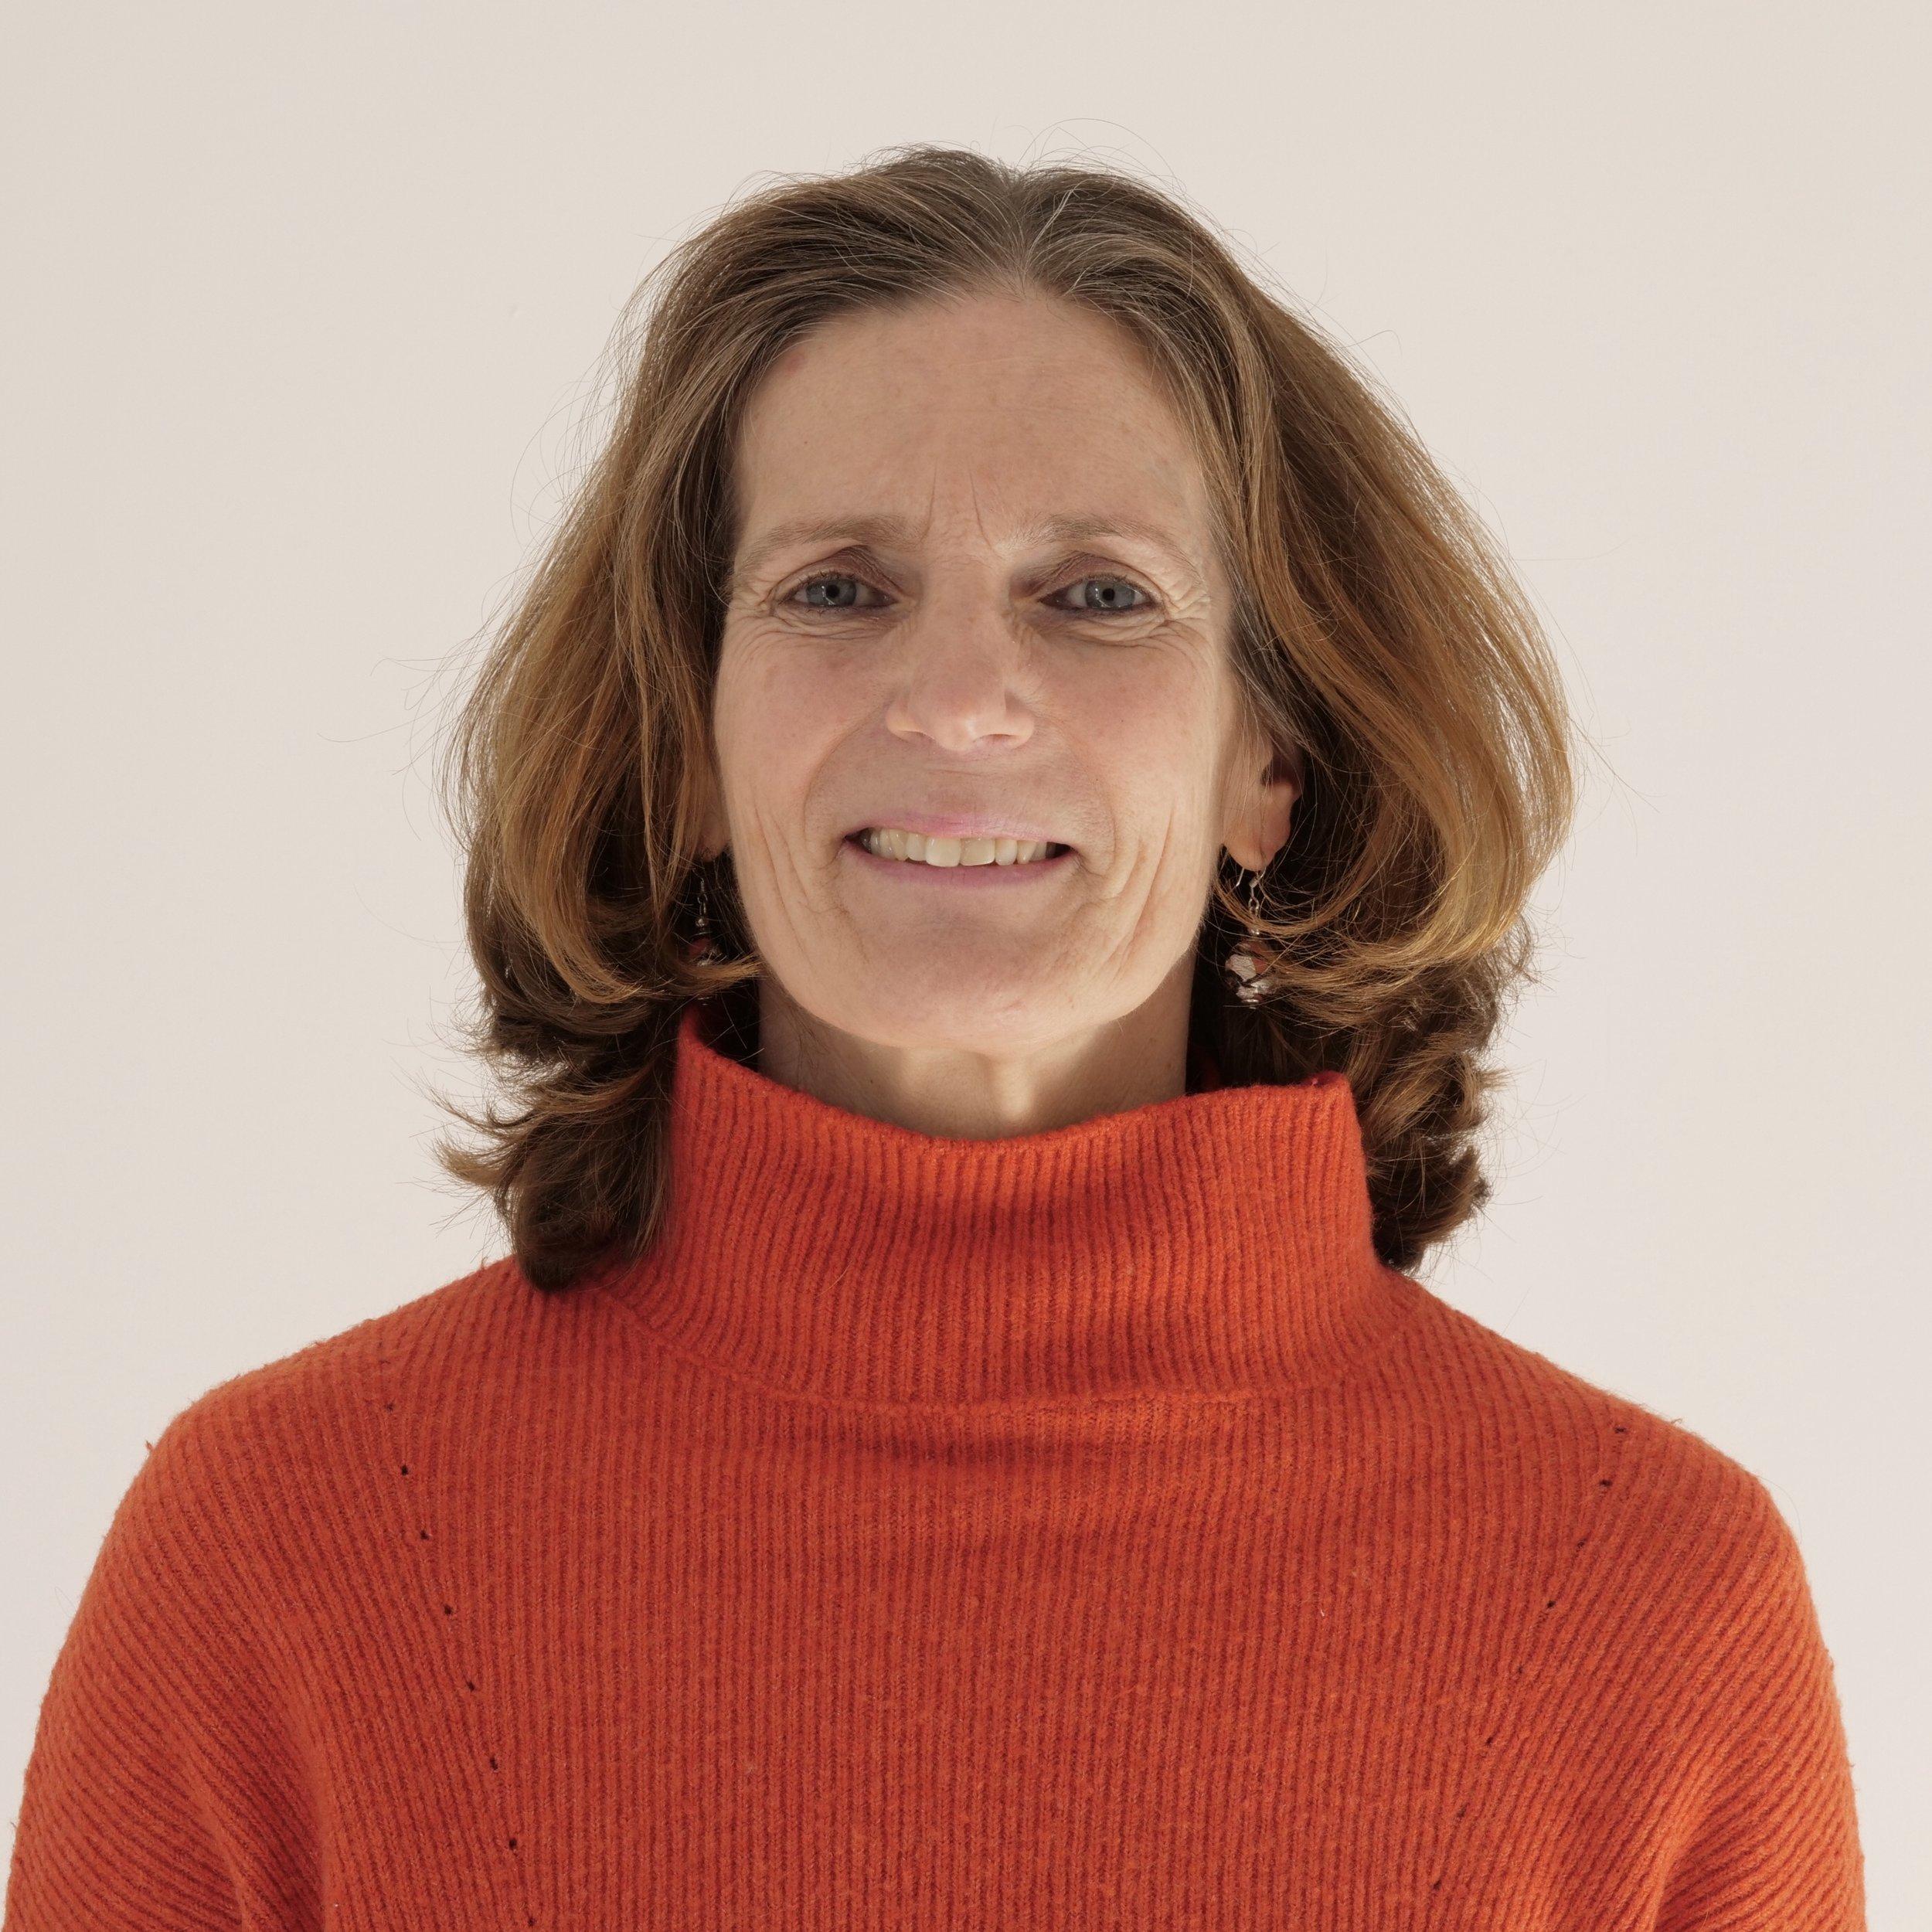 Professeur de Yoga Ventabren Christine JOBERT.jpg